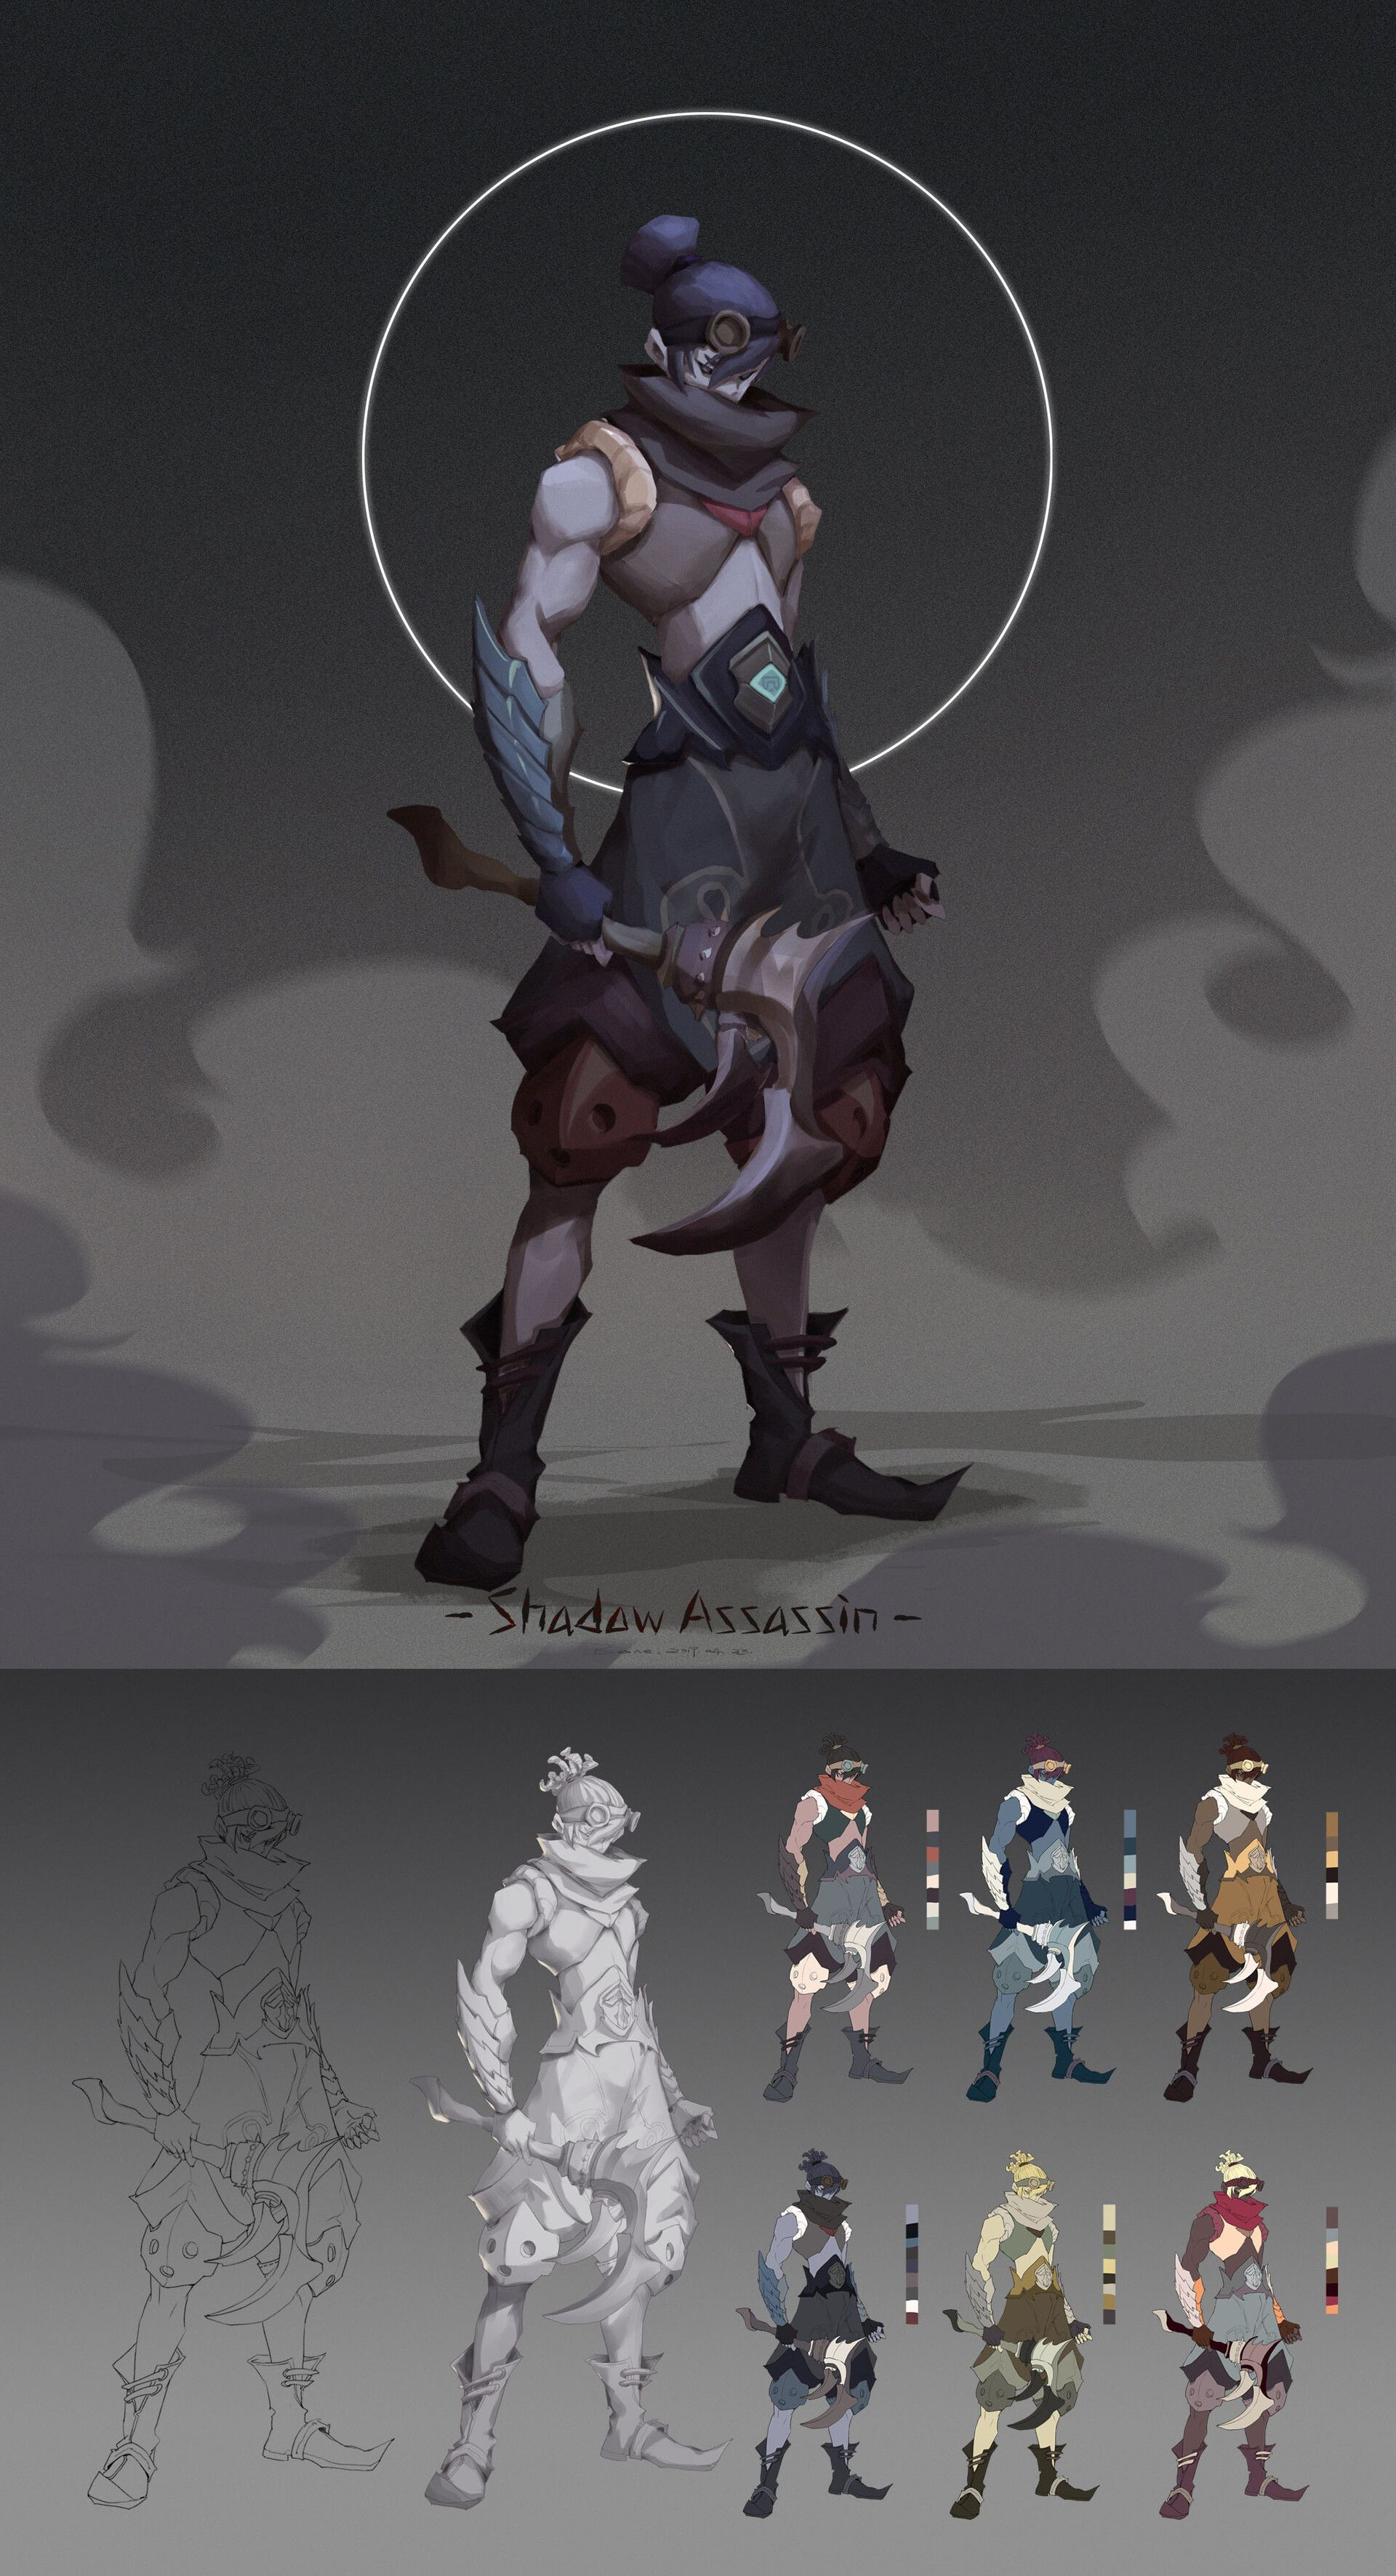 Shadow Assassin/Role design Shadow, Assassin, Artwork